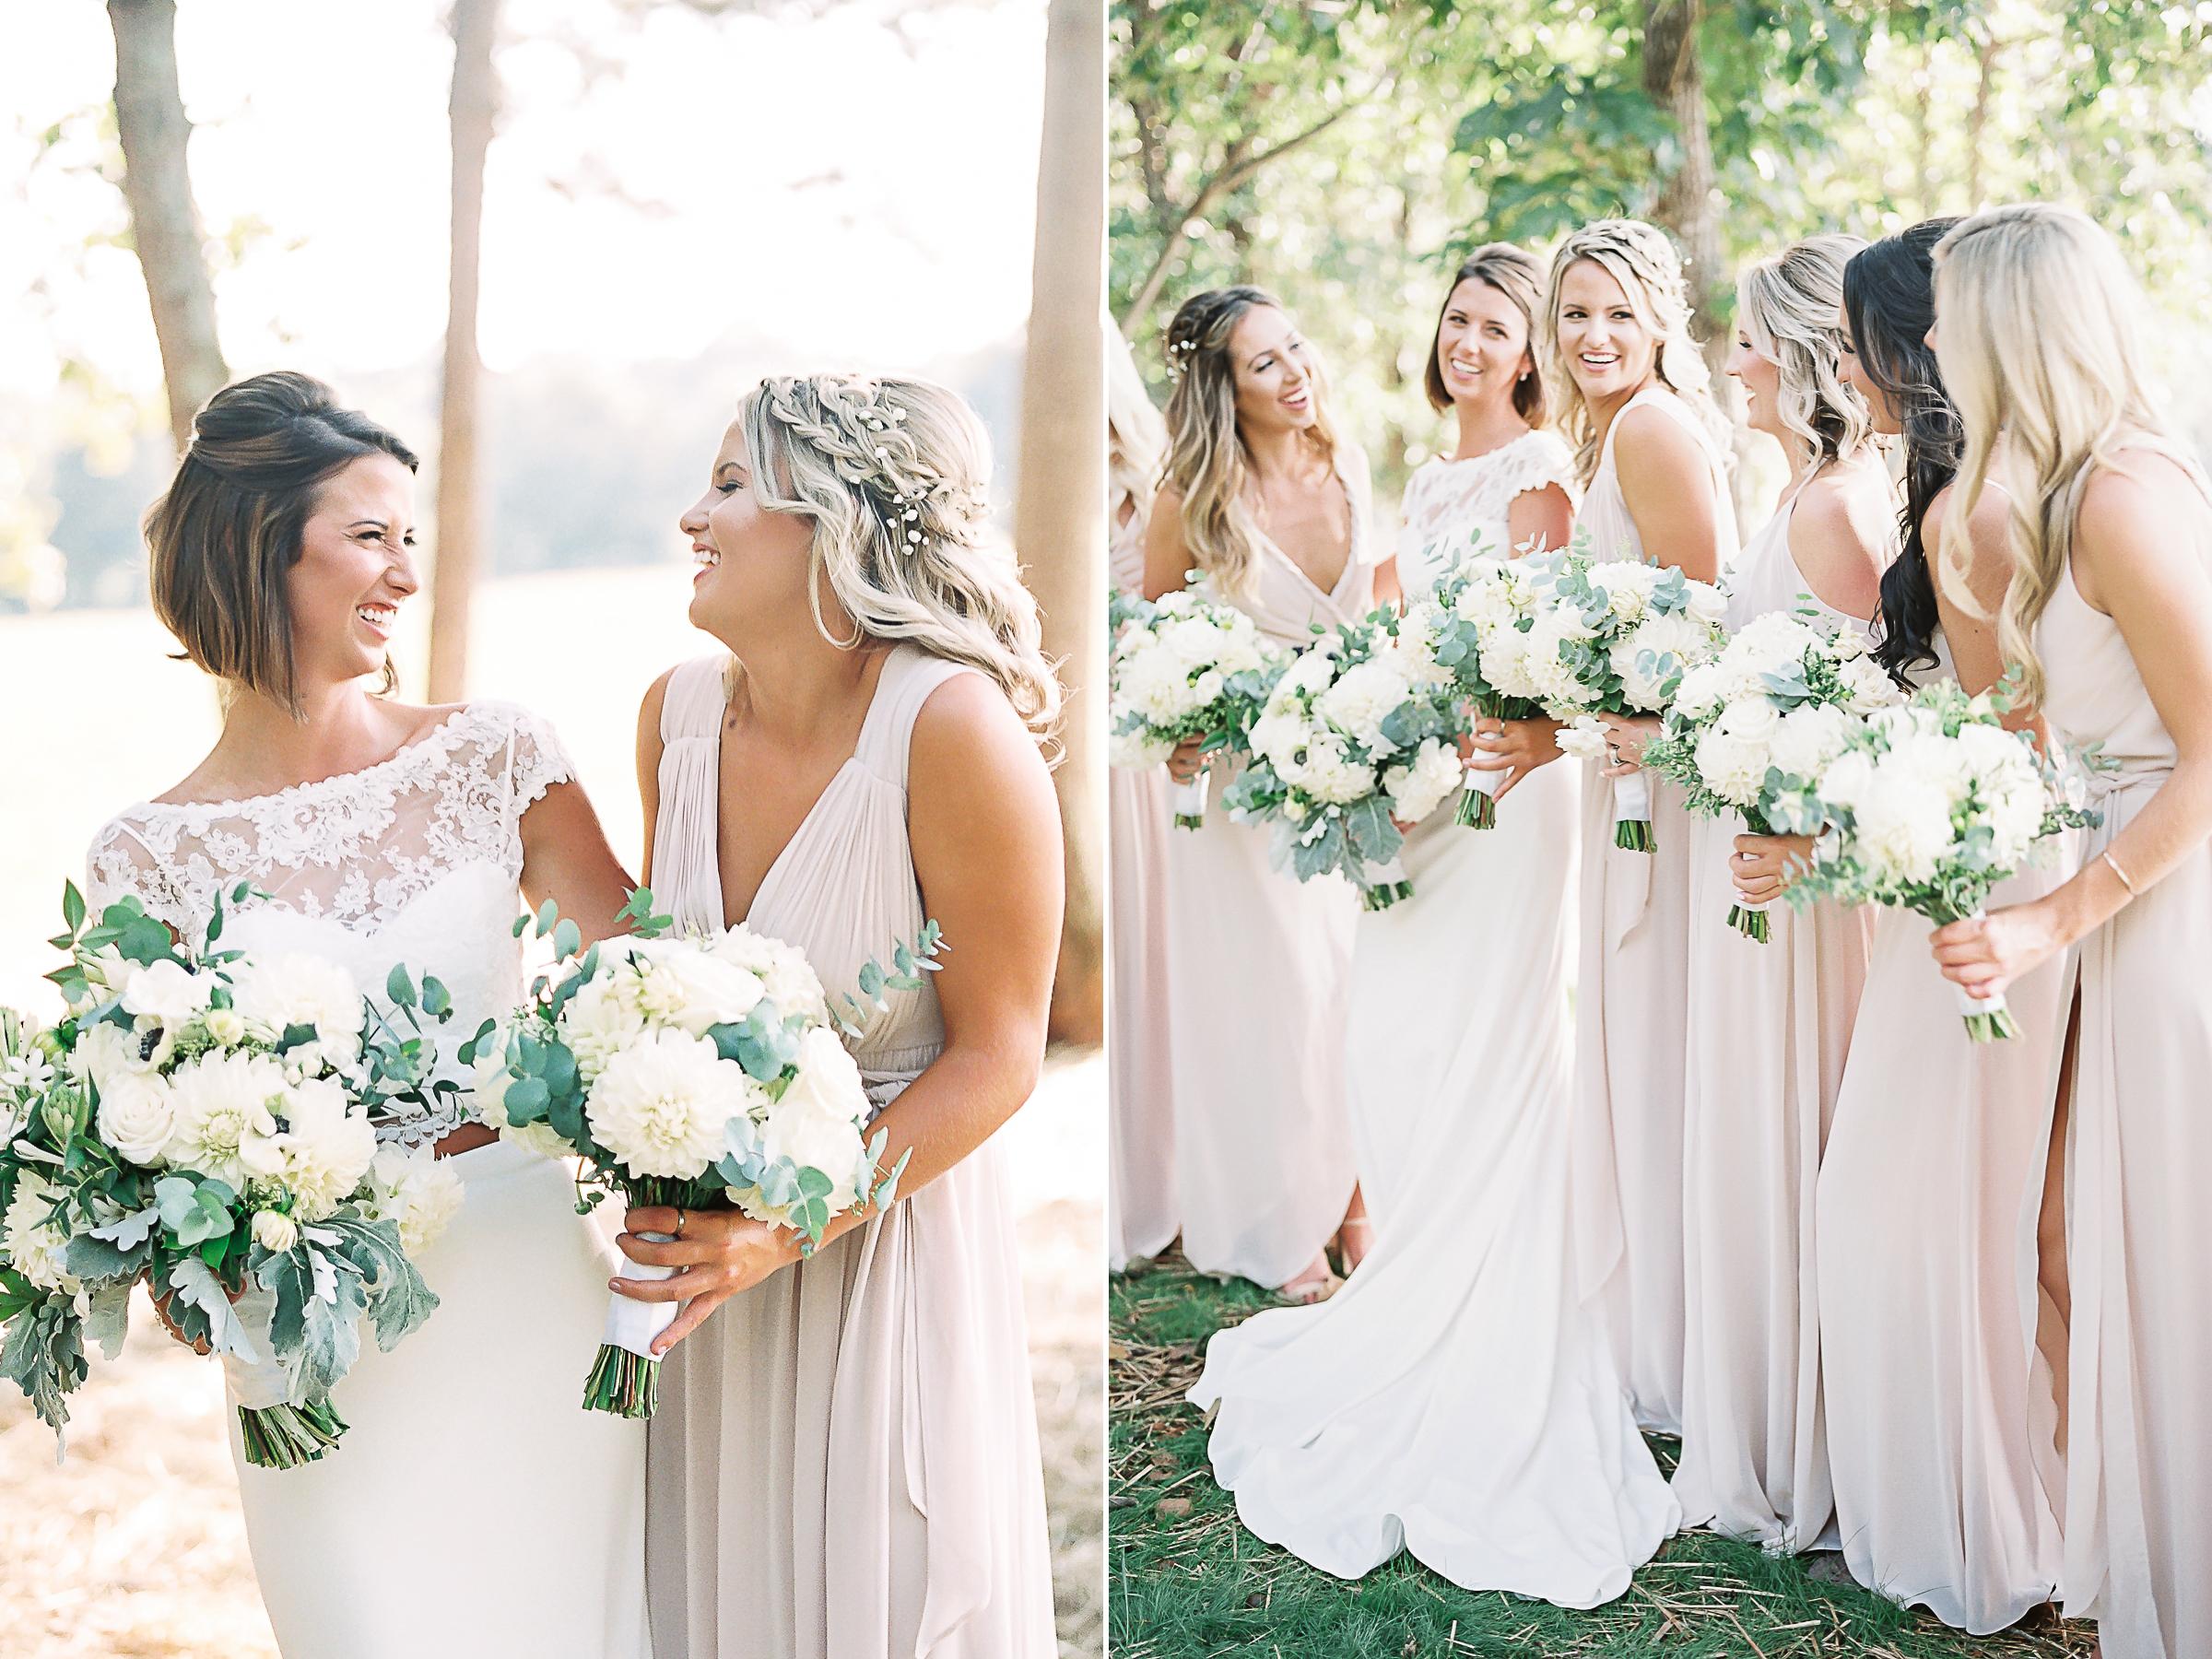 Bridesmaids looking at bride